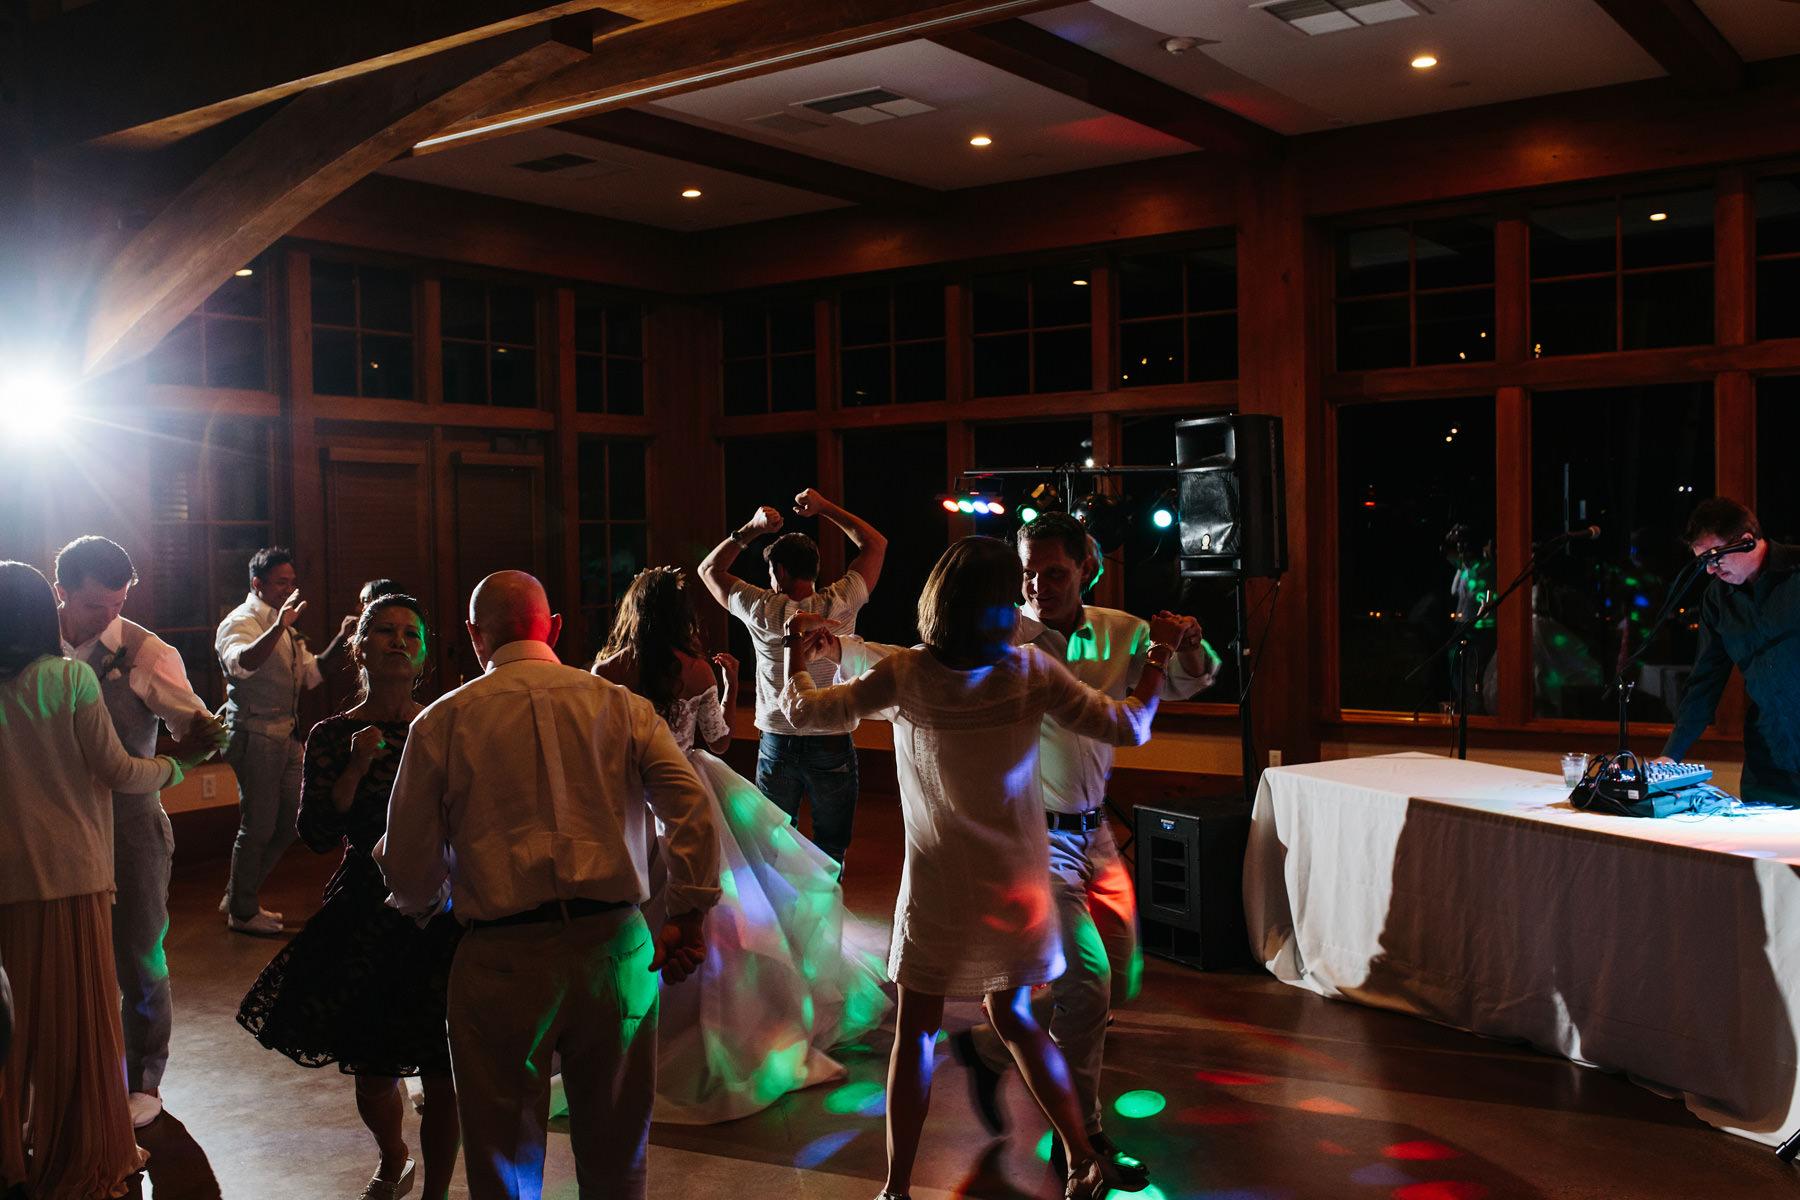 Vail Colorado Wedding Deck_ Kindling Wedding Photography84.JPG